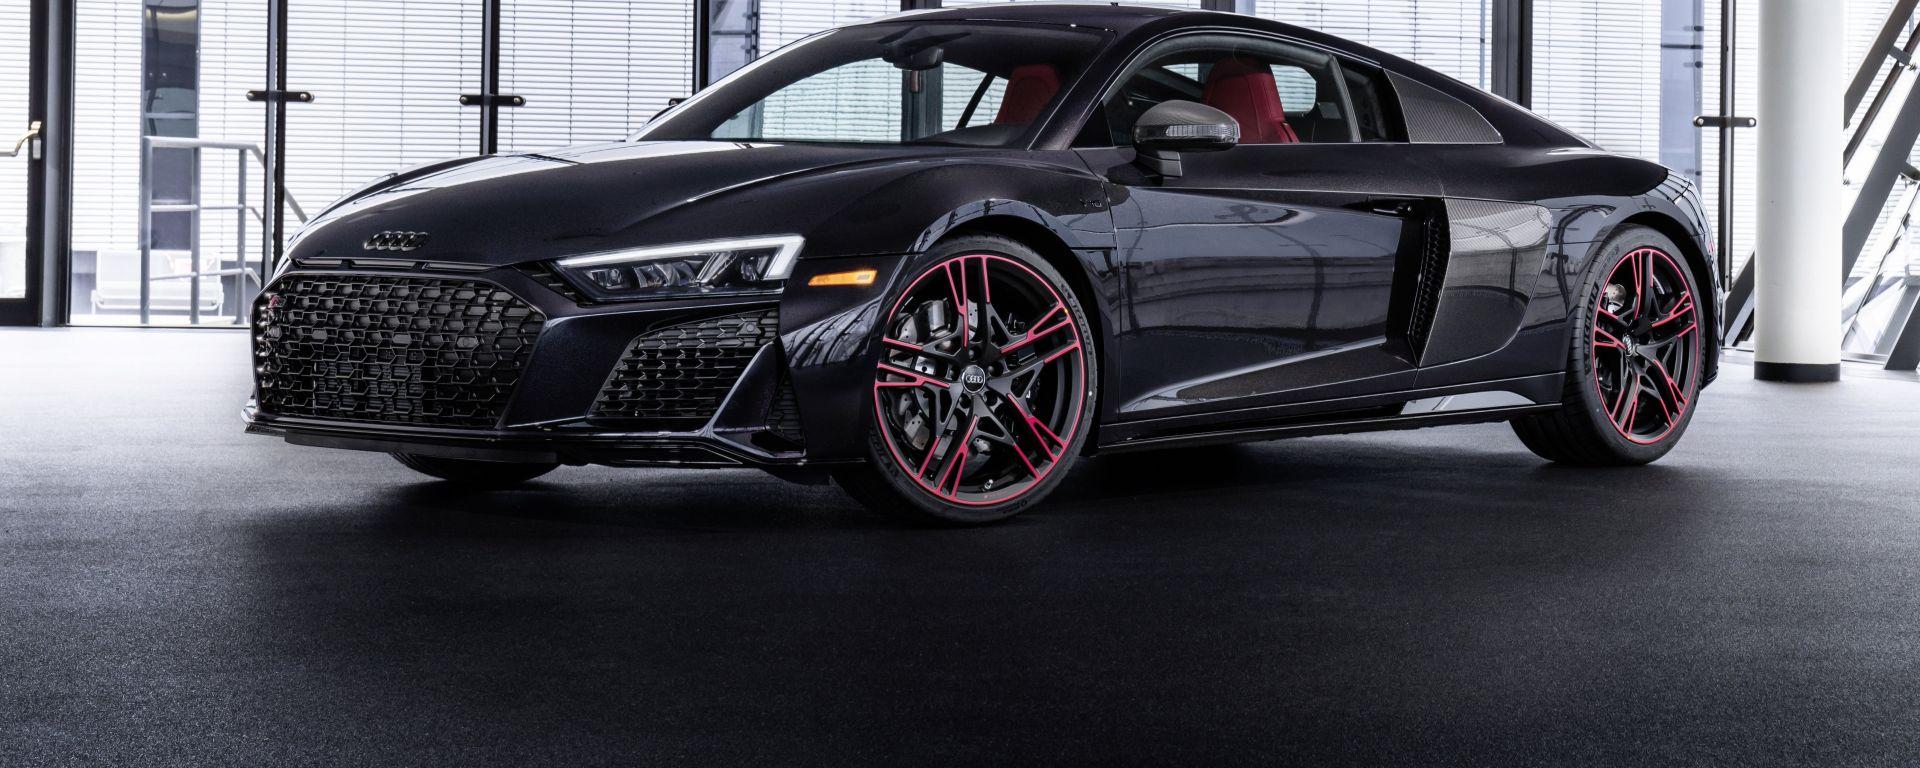 Audi R8 Panther Edition, serie limitata acchiappasguardi